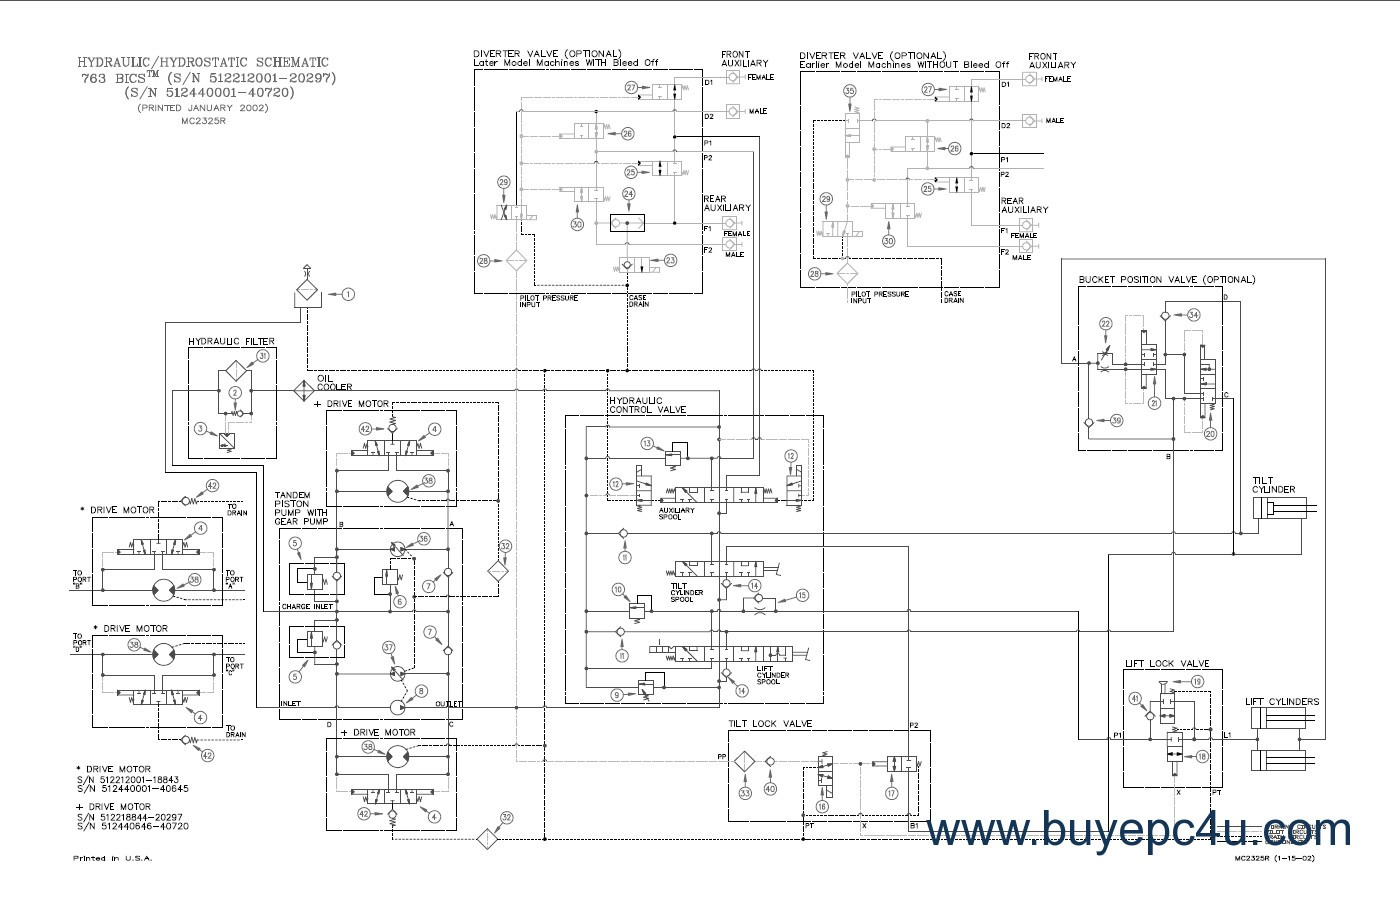 Groovy Bobcat 853 Wiring Diagram Pdf Wiring Diagram Database Wiring Cloud Overrenstrafr09Org